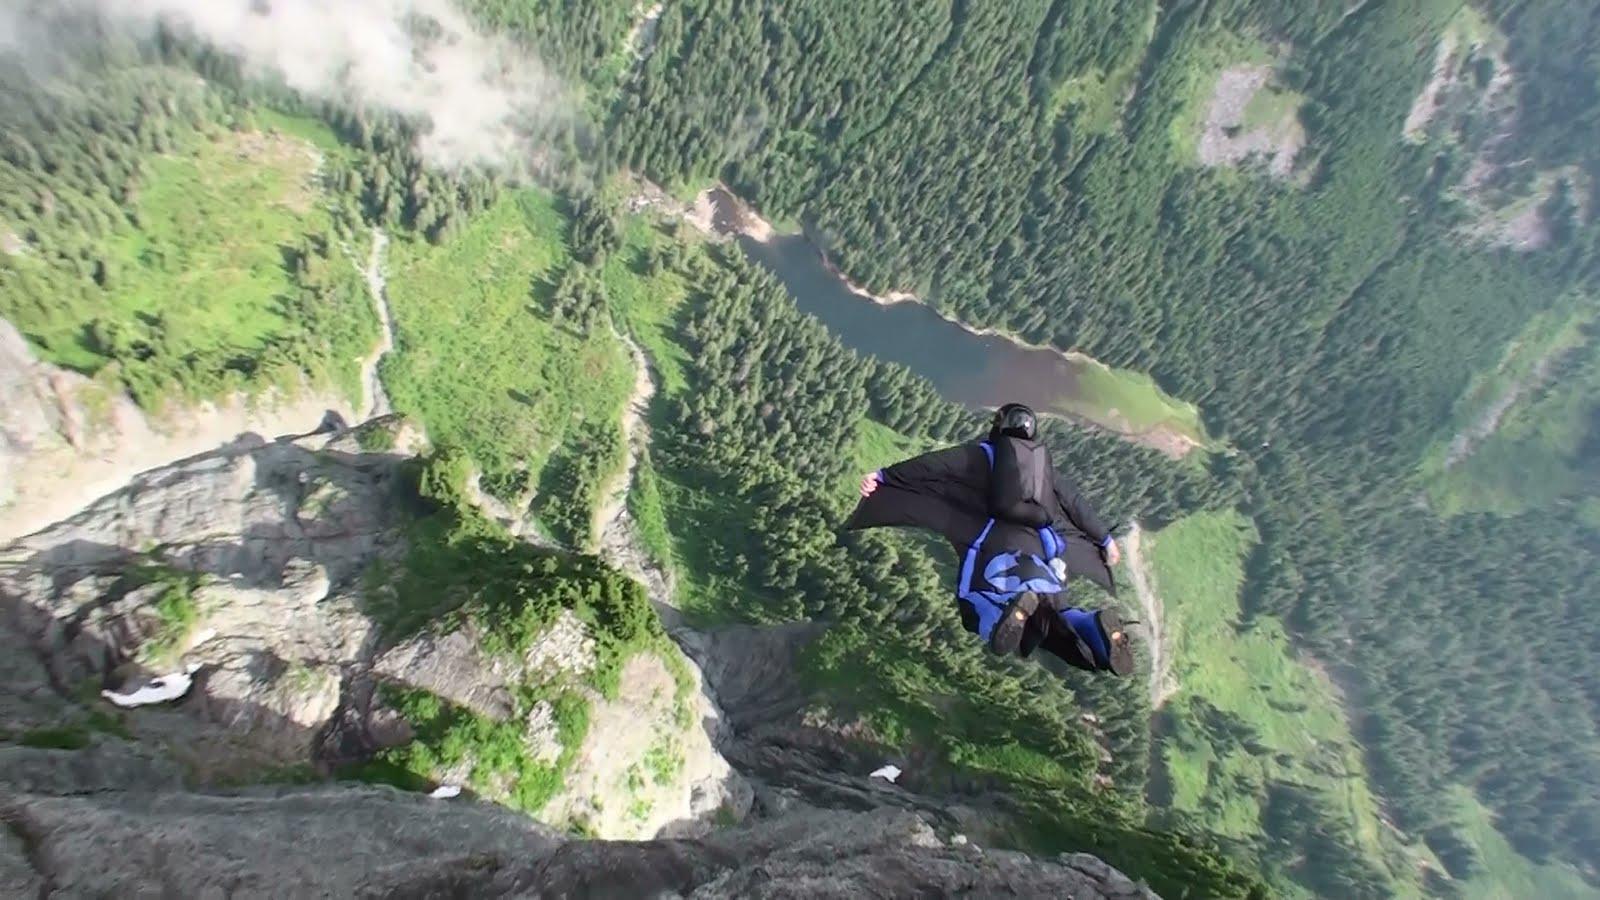 http://1.bp.blogspot.com/-j1e9YbnRPtg/TjAHChhKZhI/AAAAAAAABCI/Xc-FfSRq3Bk/s1600/Wingsuit-Jump-3.JPG